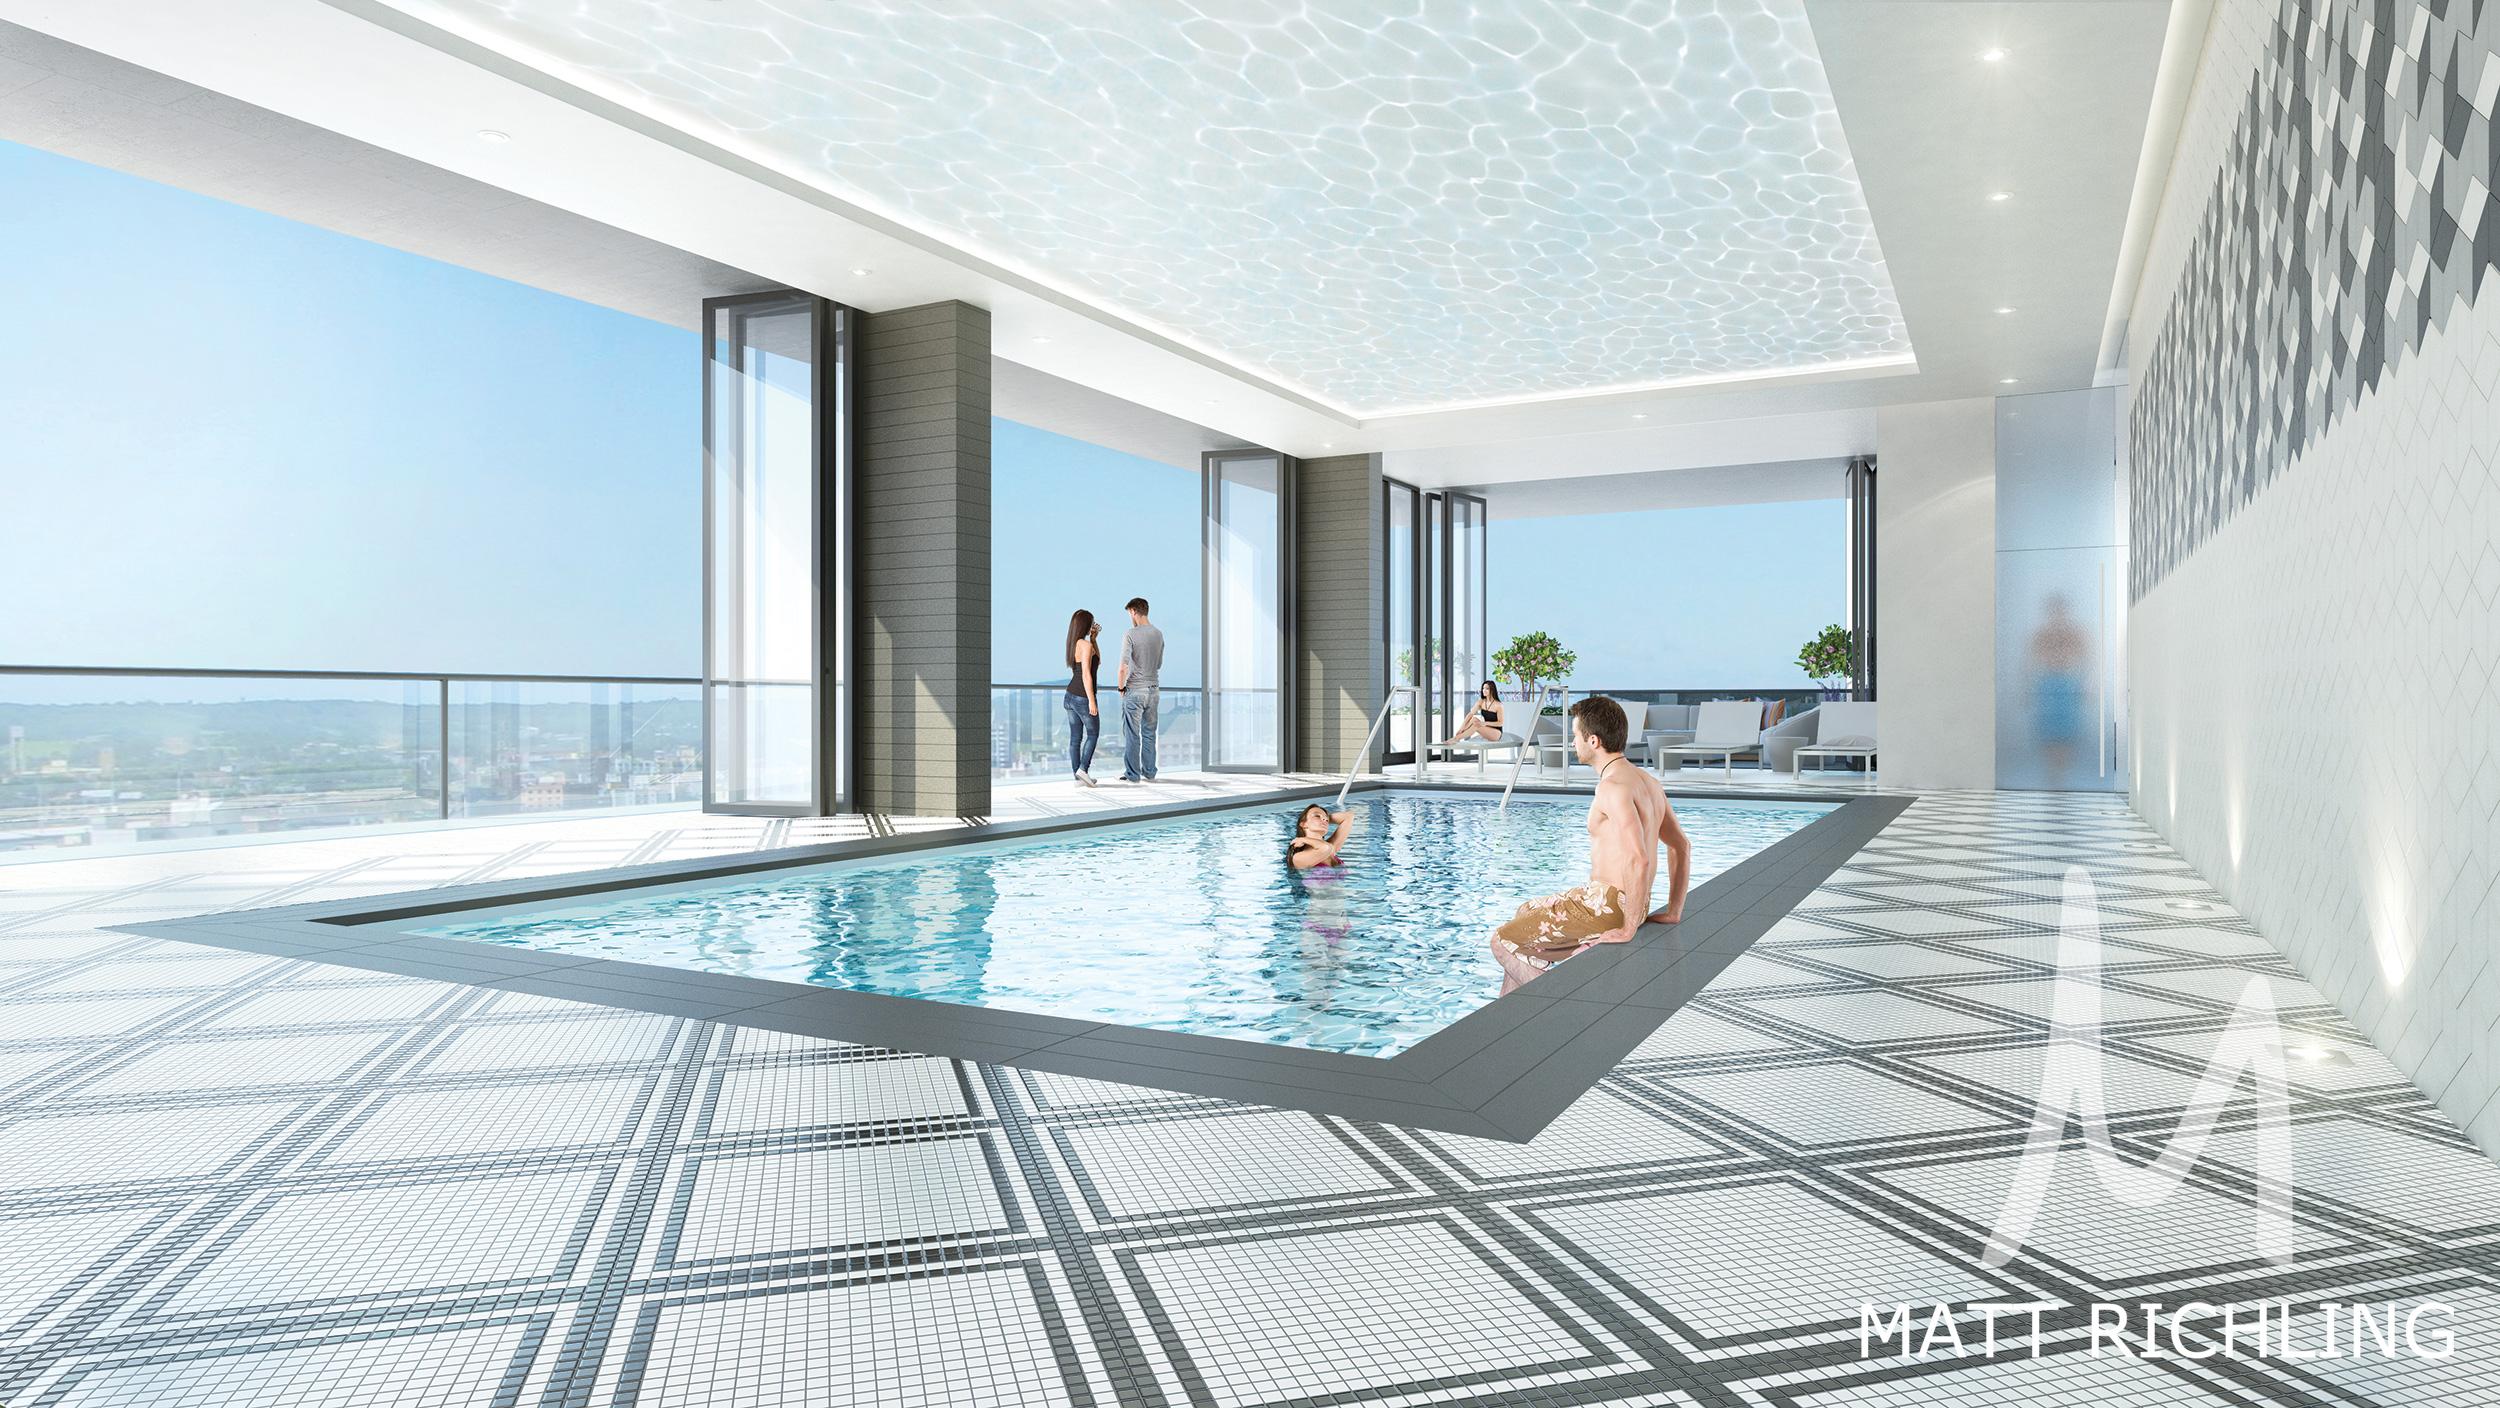 bowery-pool.jpg